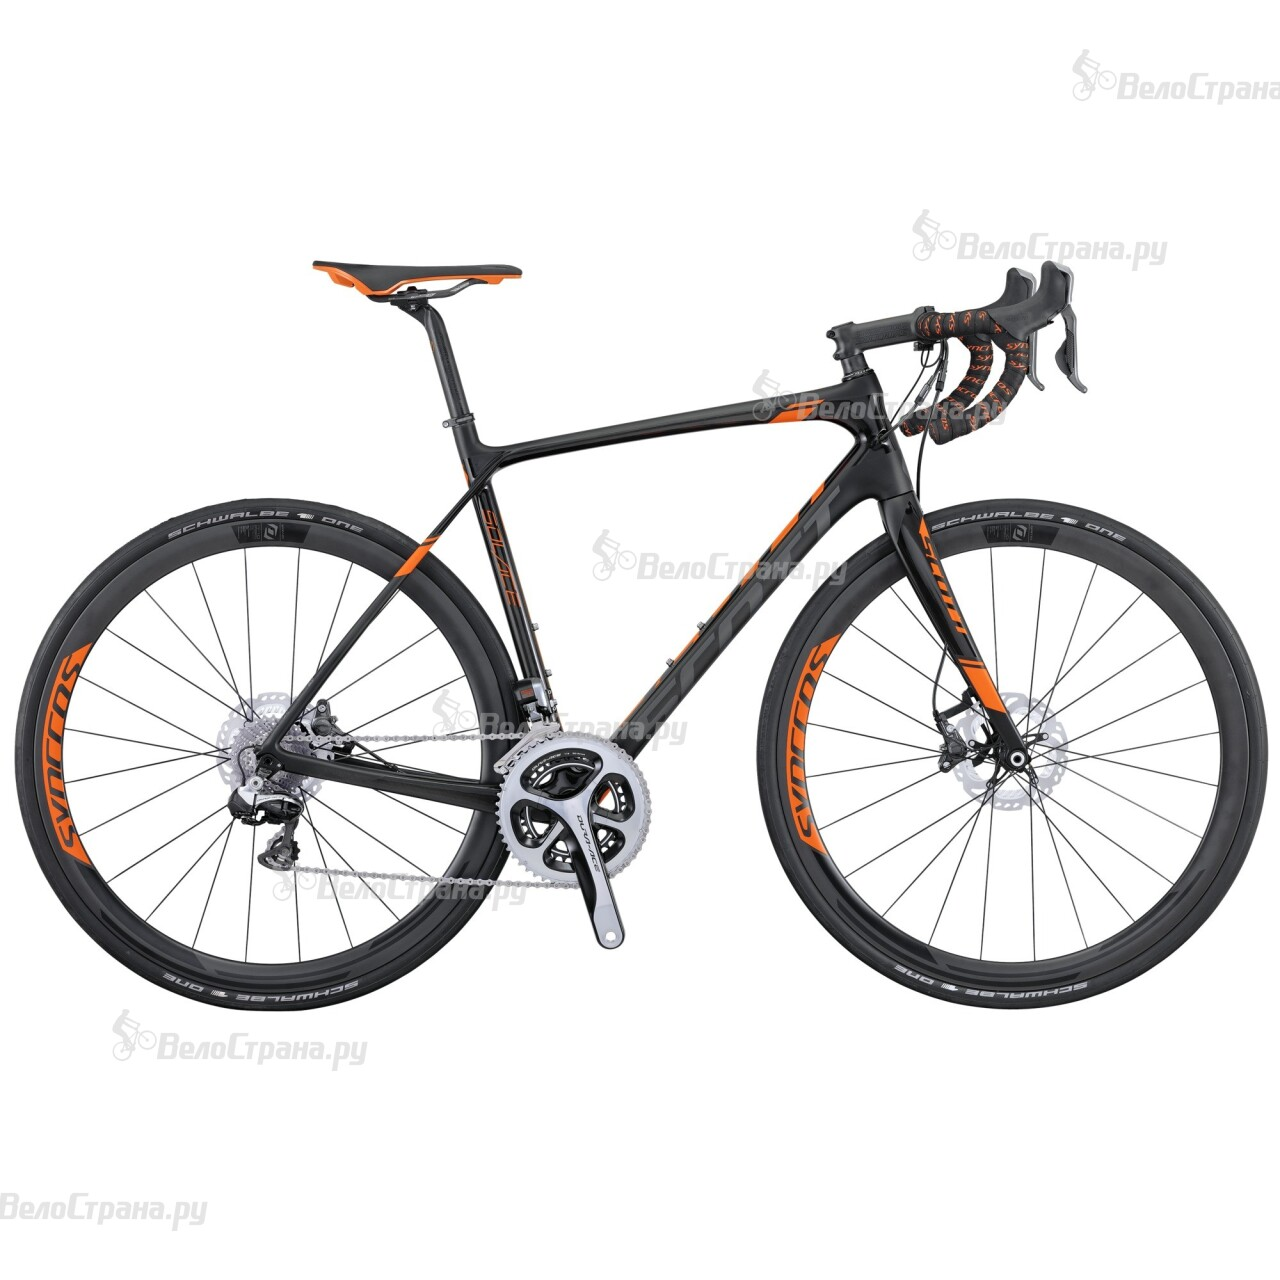 Велосипед Scott Solace Premium Disc (2016) велосипед scott contessa solace 15 compact 2015